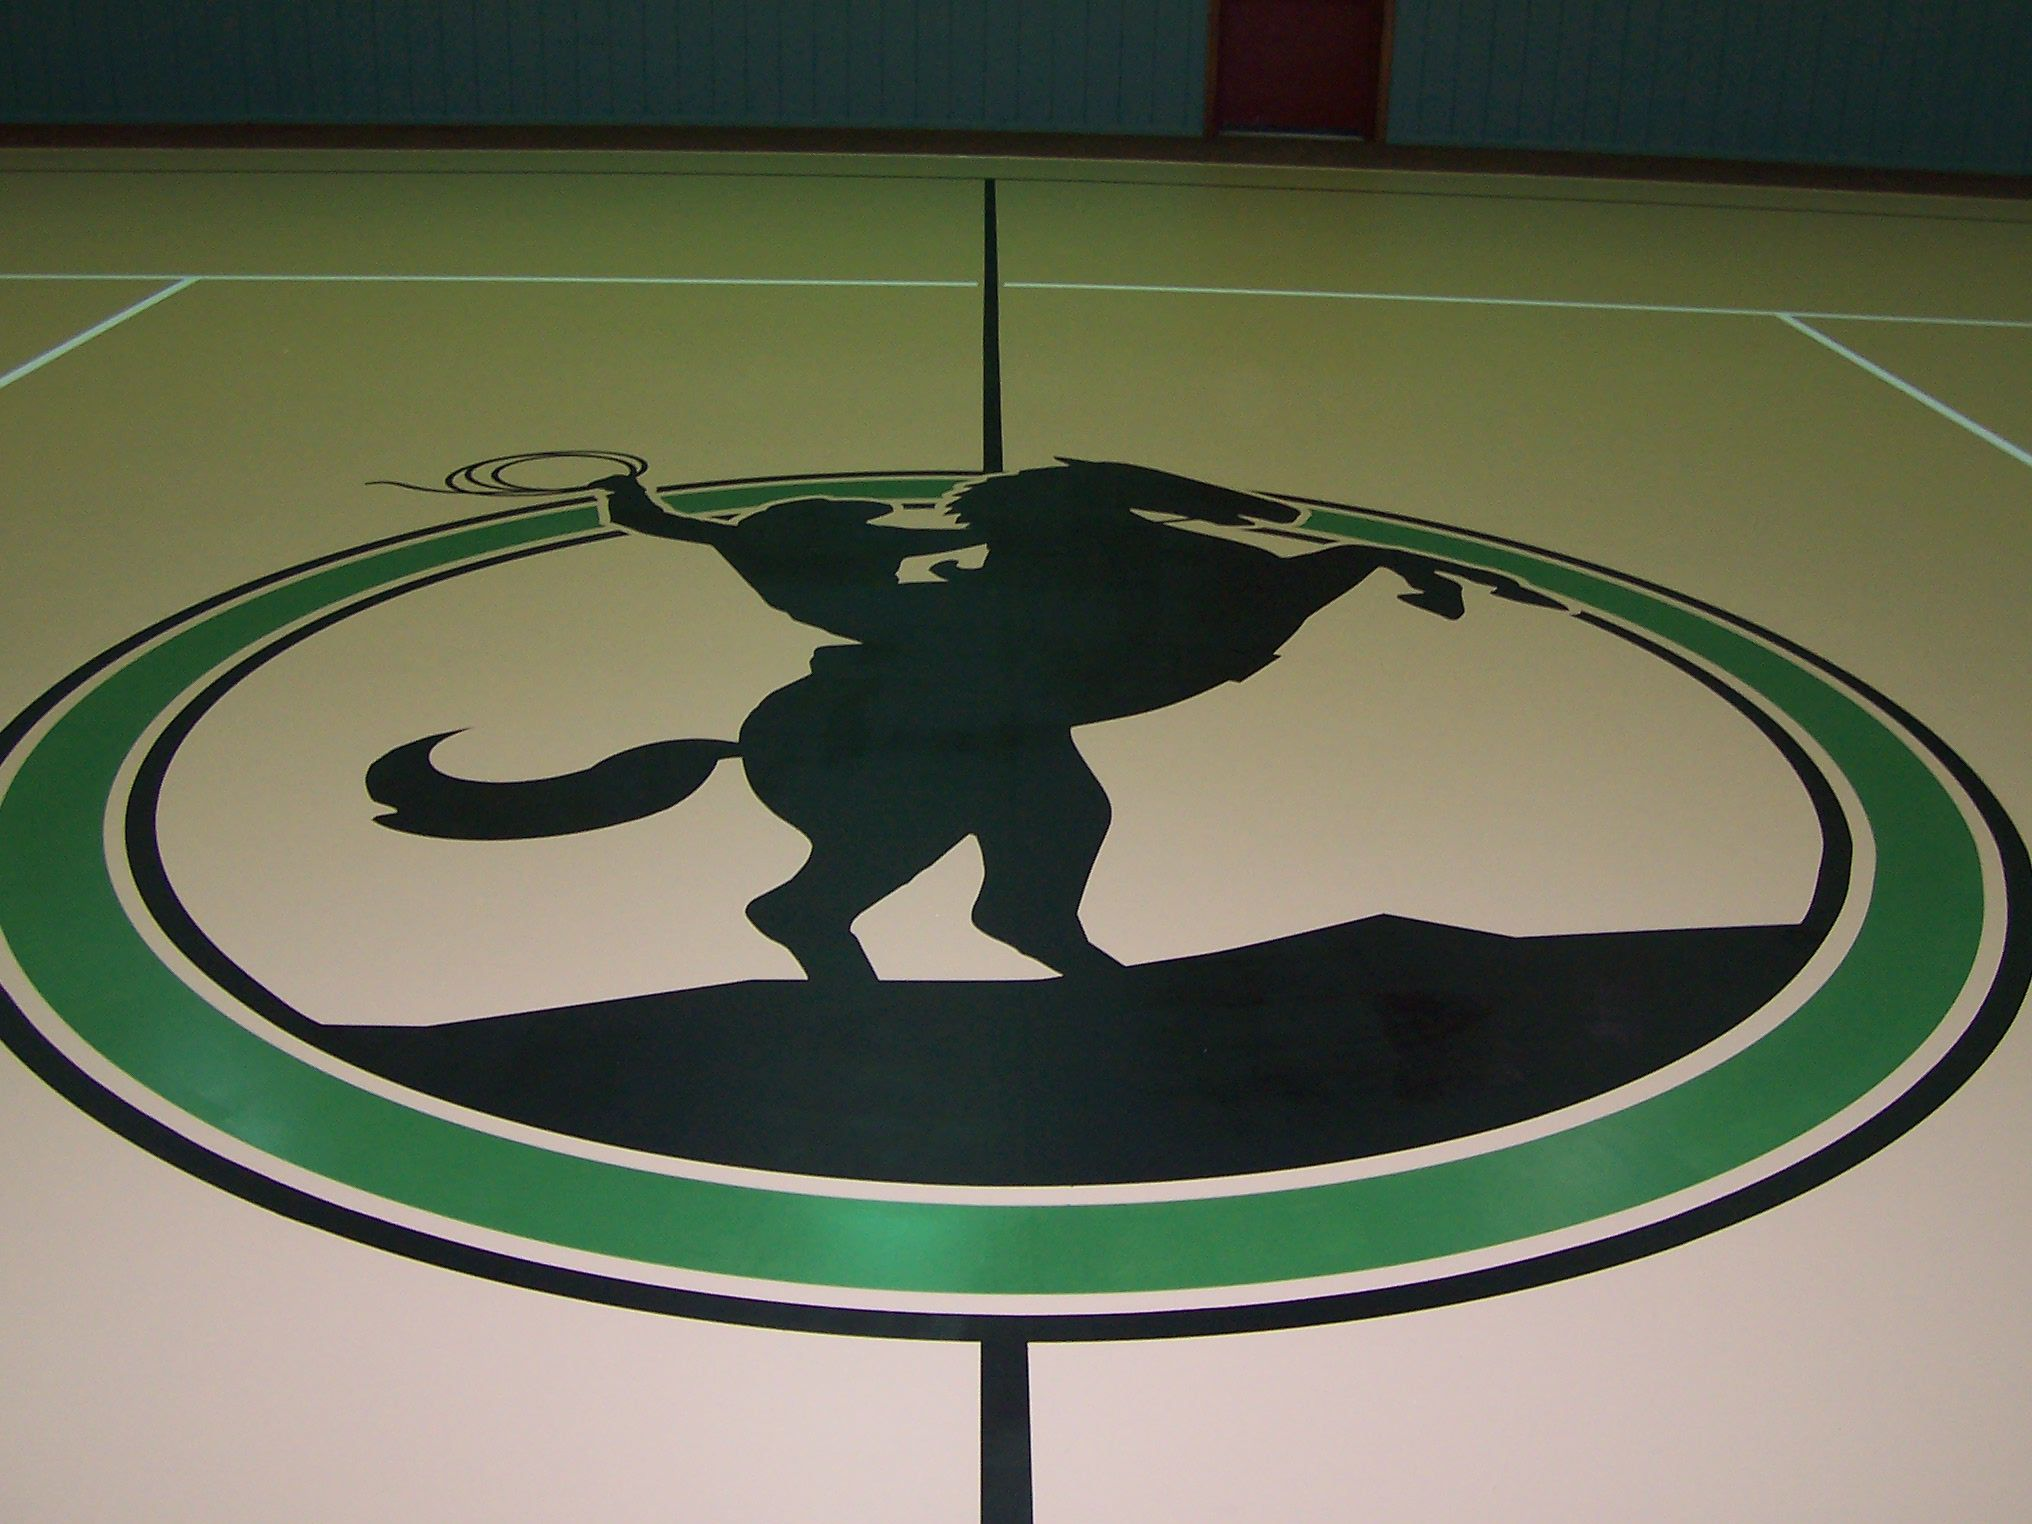 Gym Flooring Indoor Basketball Court Sports Floor Construction Indoor Basketball Court Gym Flooring Indoor Basketball